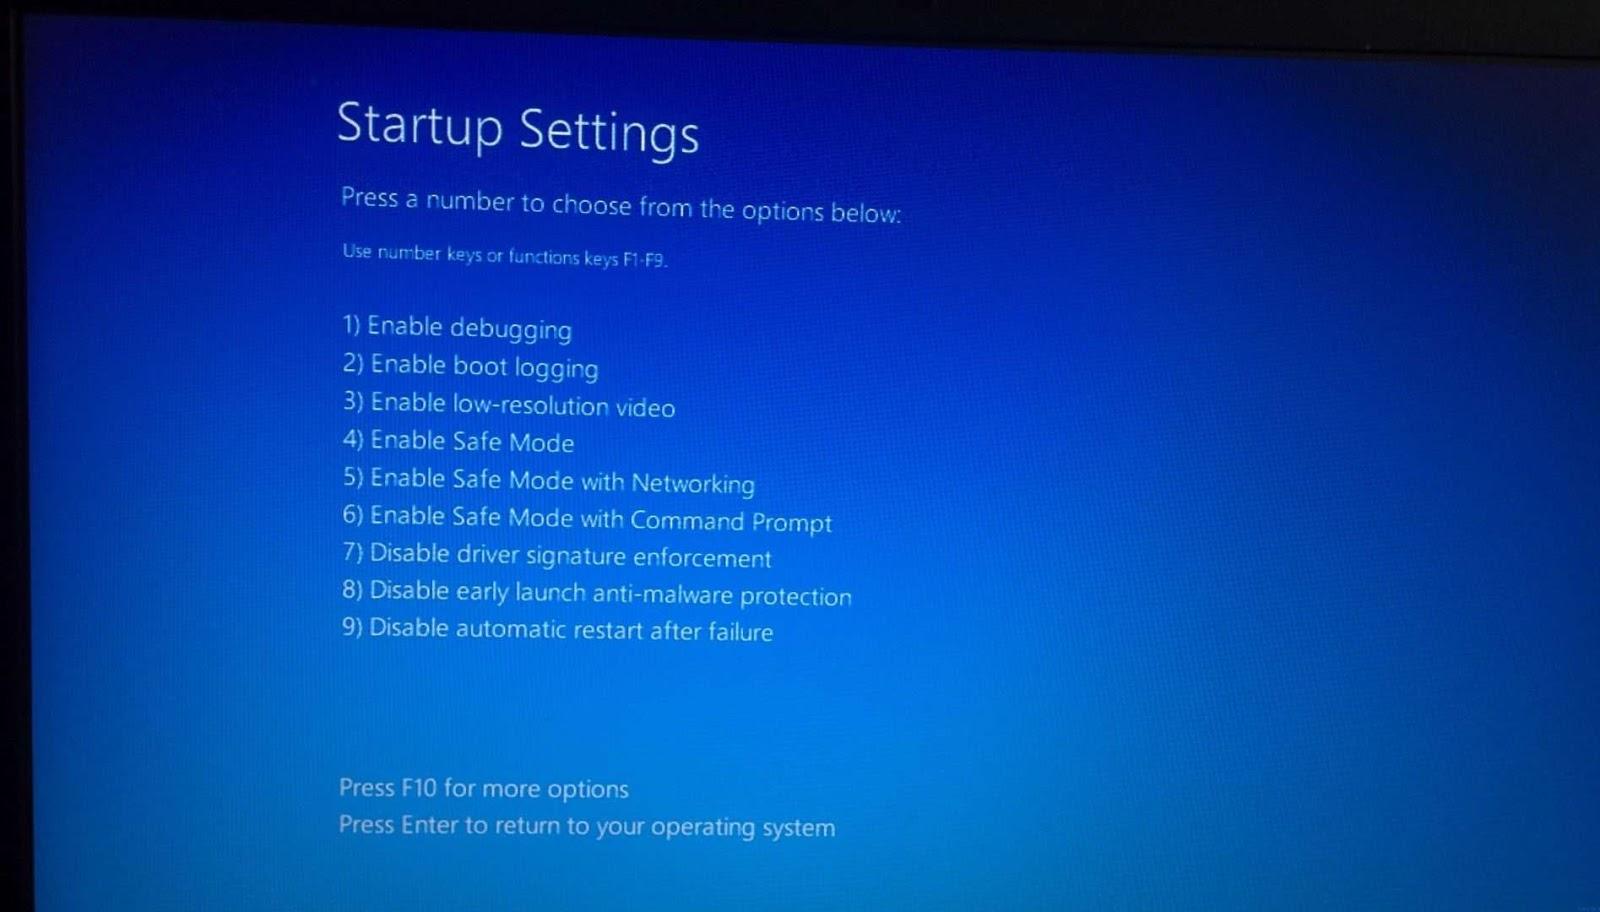 Fix Blue Screen of Death (BSoD) Errors in Windows - Technology tips